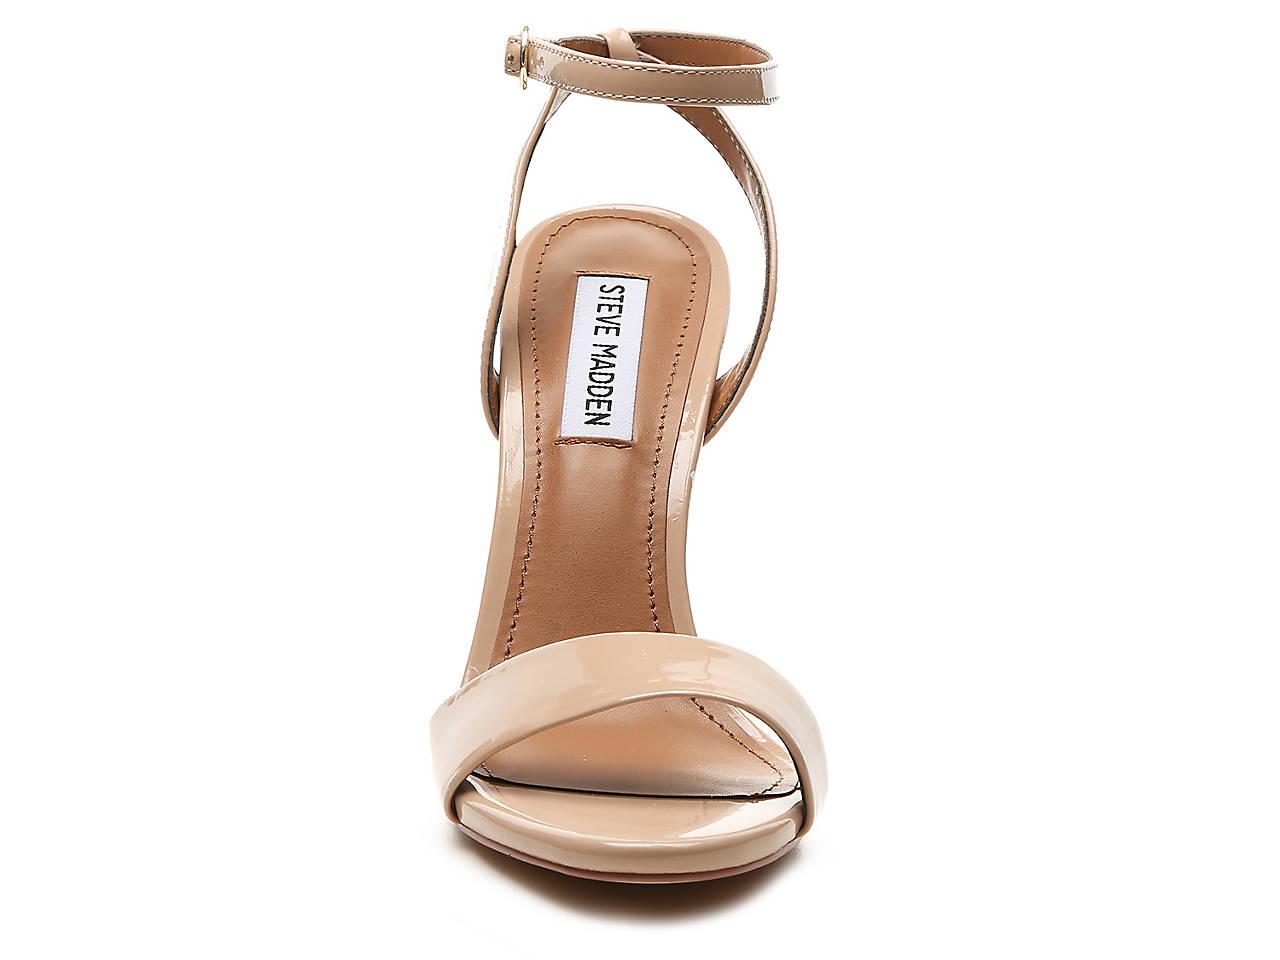 c02bf8d40 Home · Women's Shoes · Sandals; Reno Sandal. previous